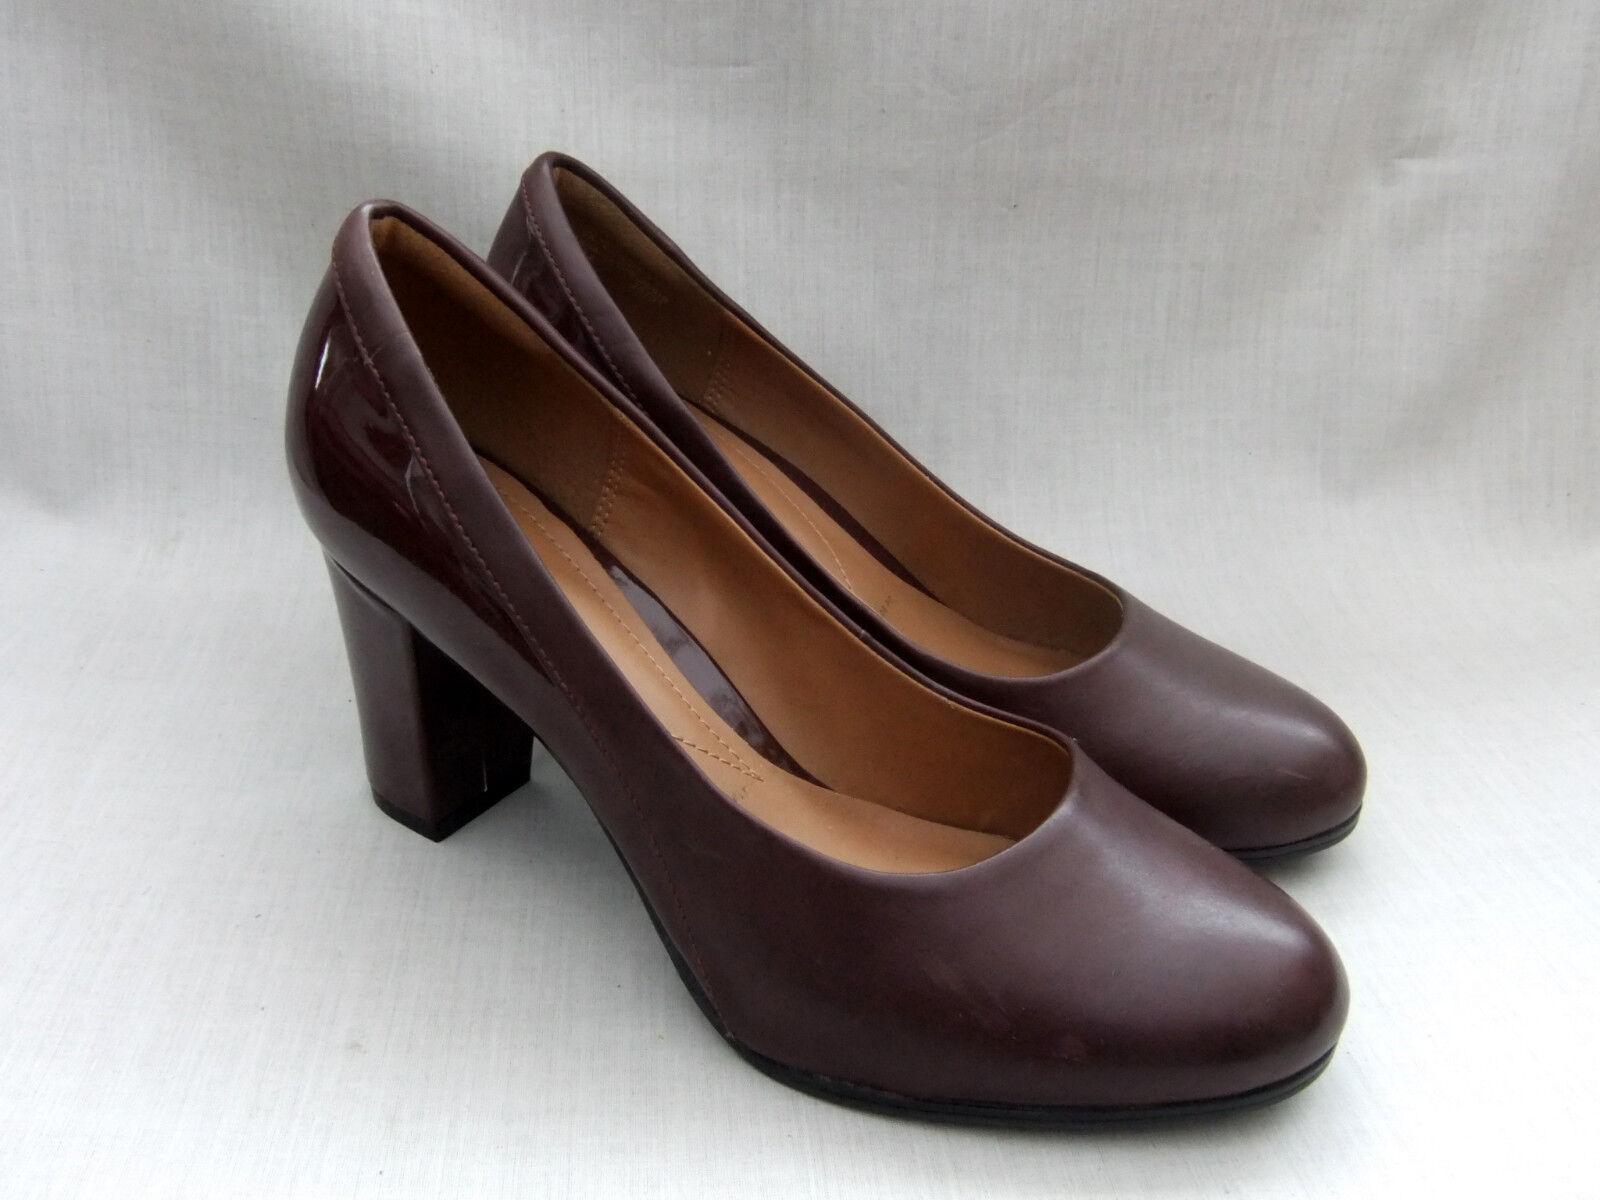 New Clarks Basil Auburn Bourgogne Cuir Cuir Verni Chaussures 7 41 wide fit